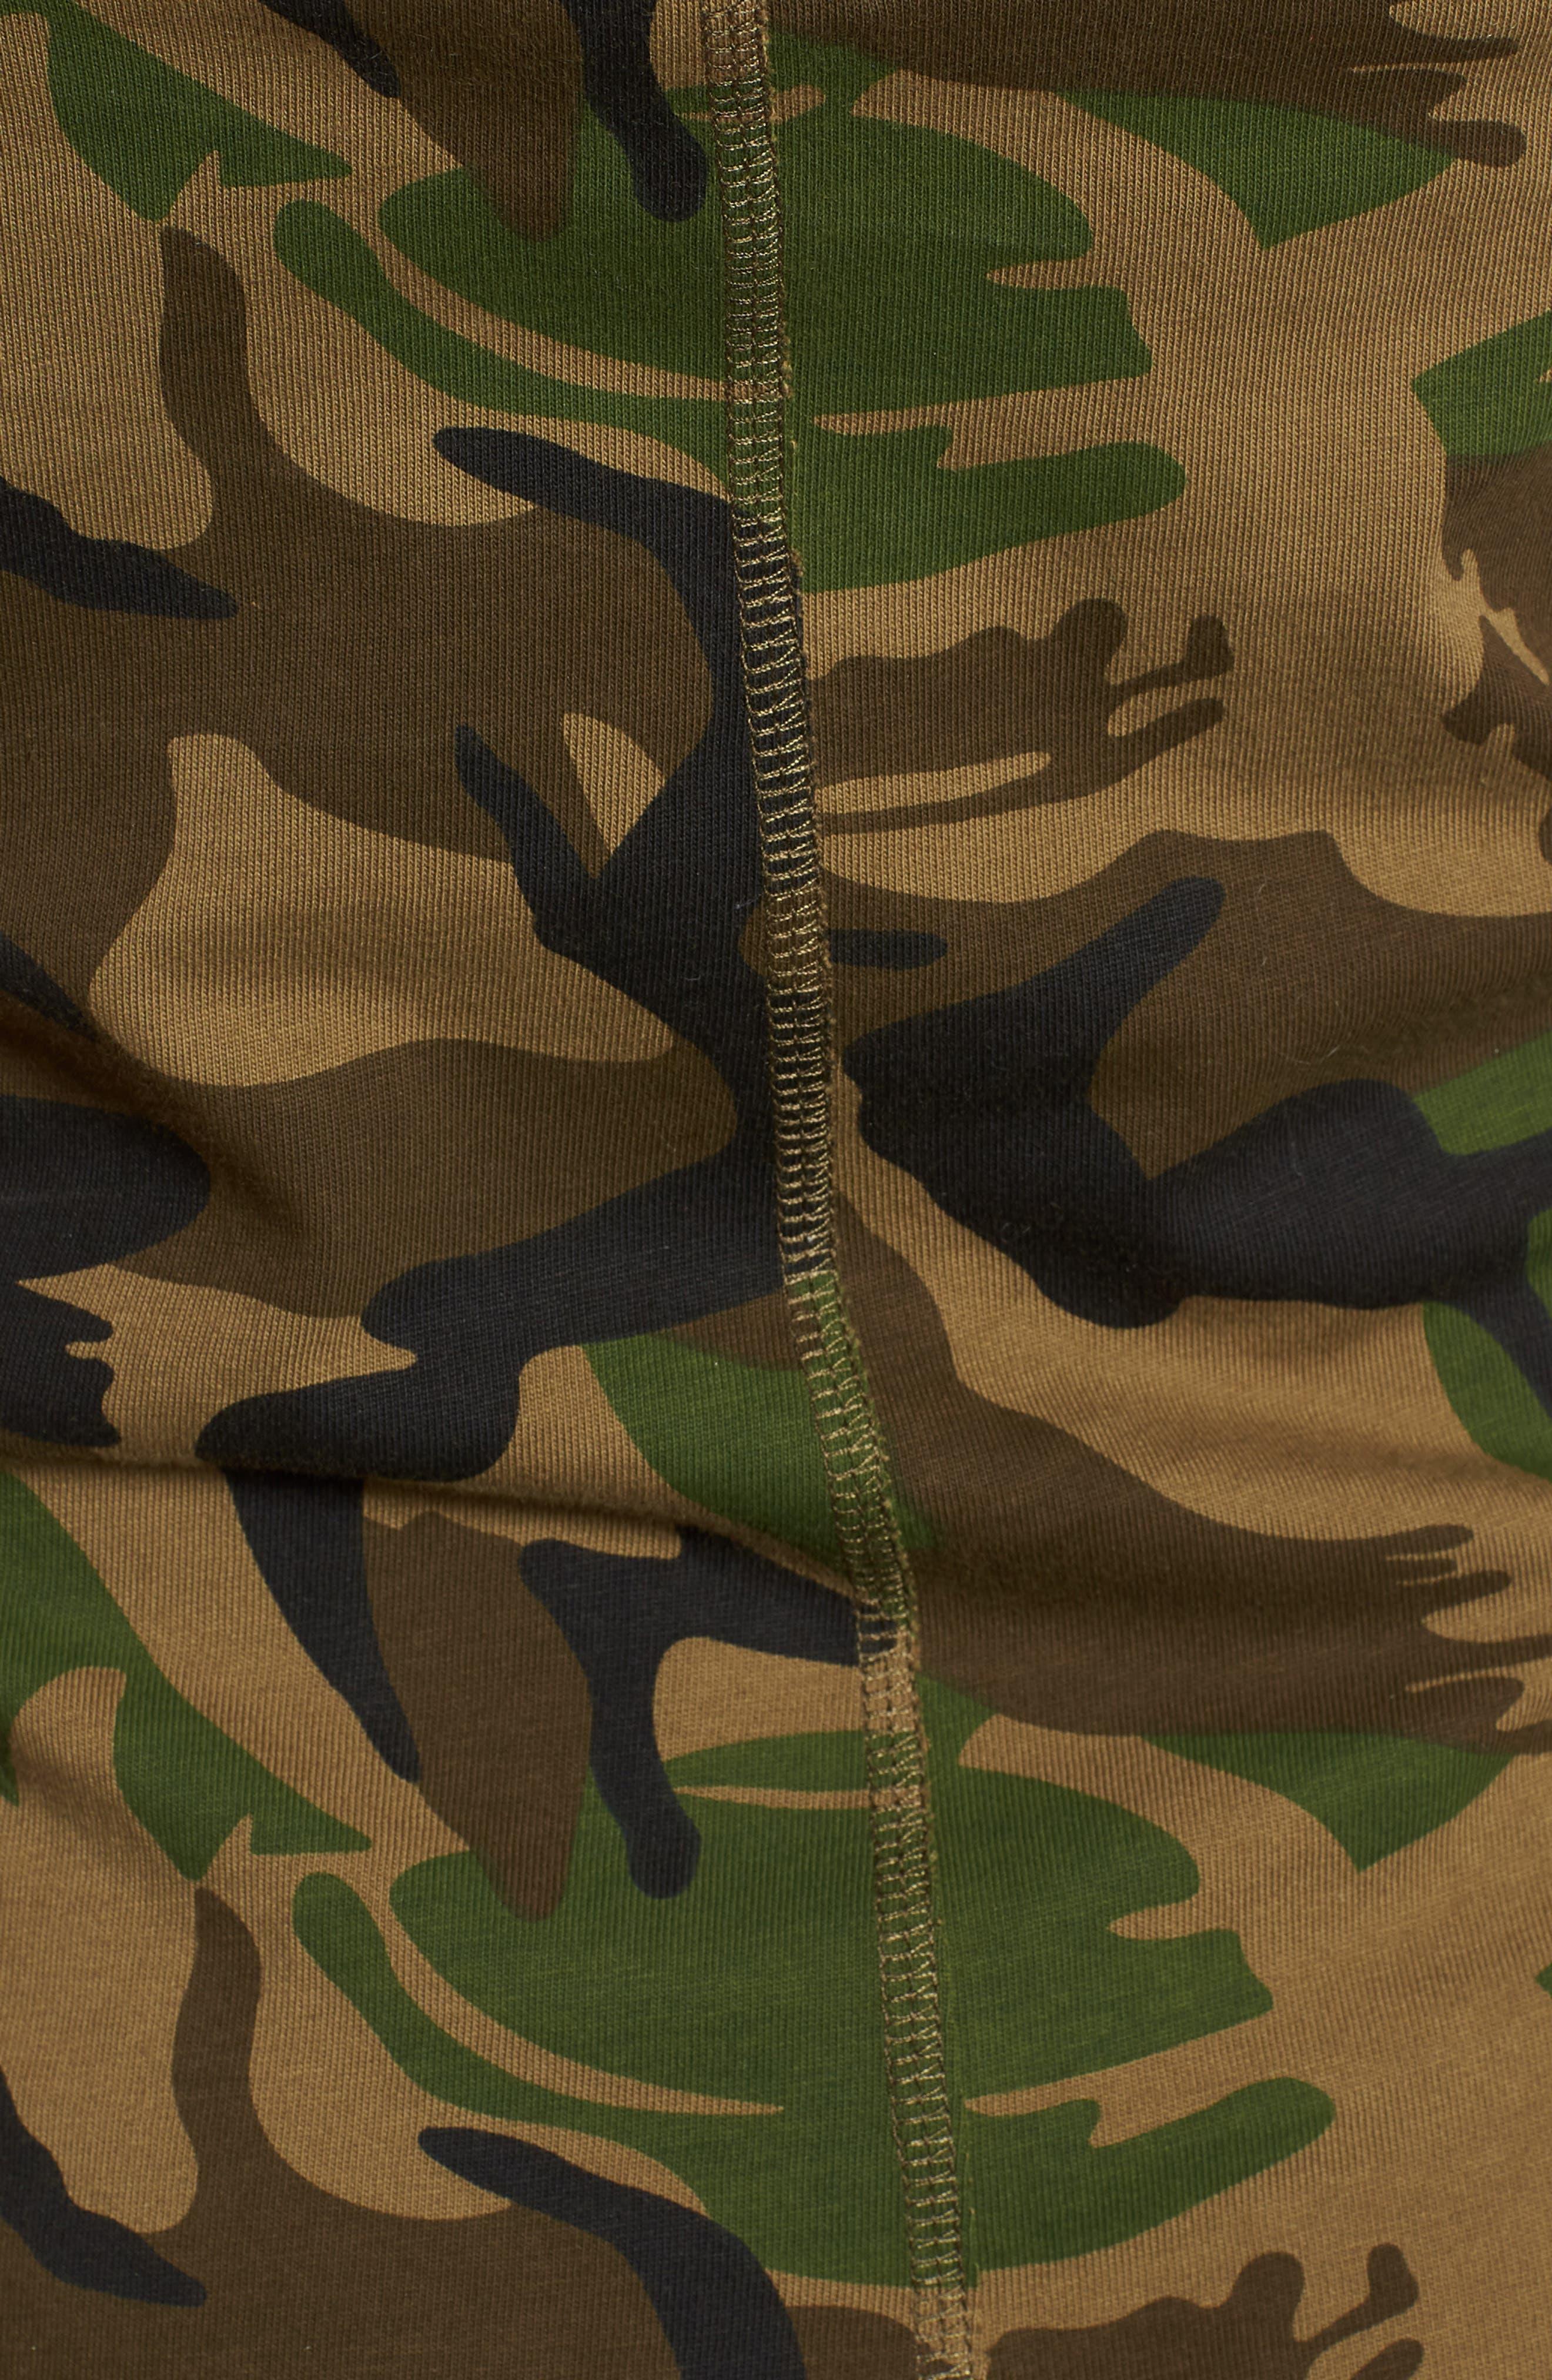 Camo Print Tank Dress,                             Alternate thumbnail 6, color,                             ARMY CAMO